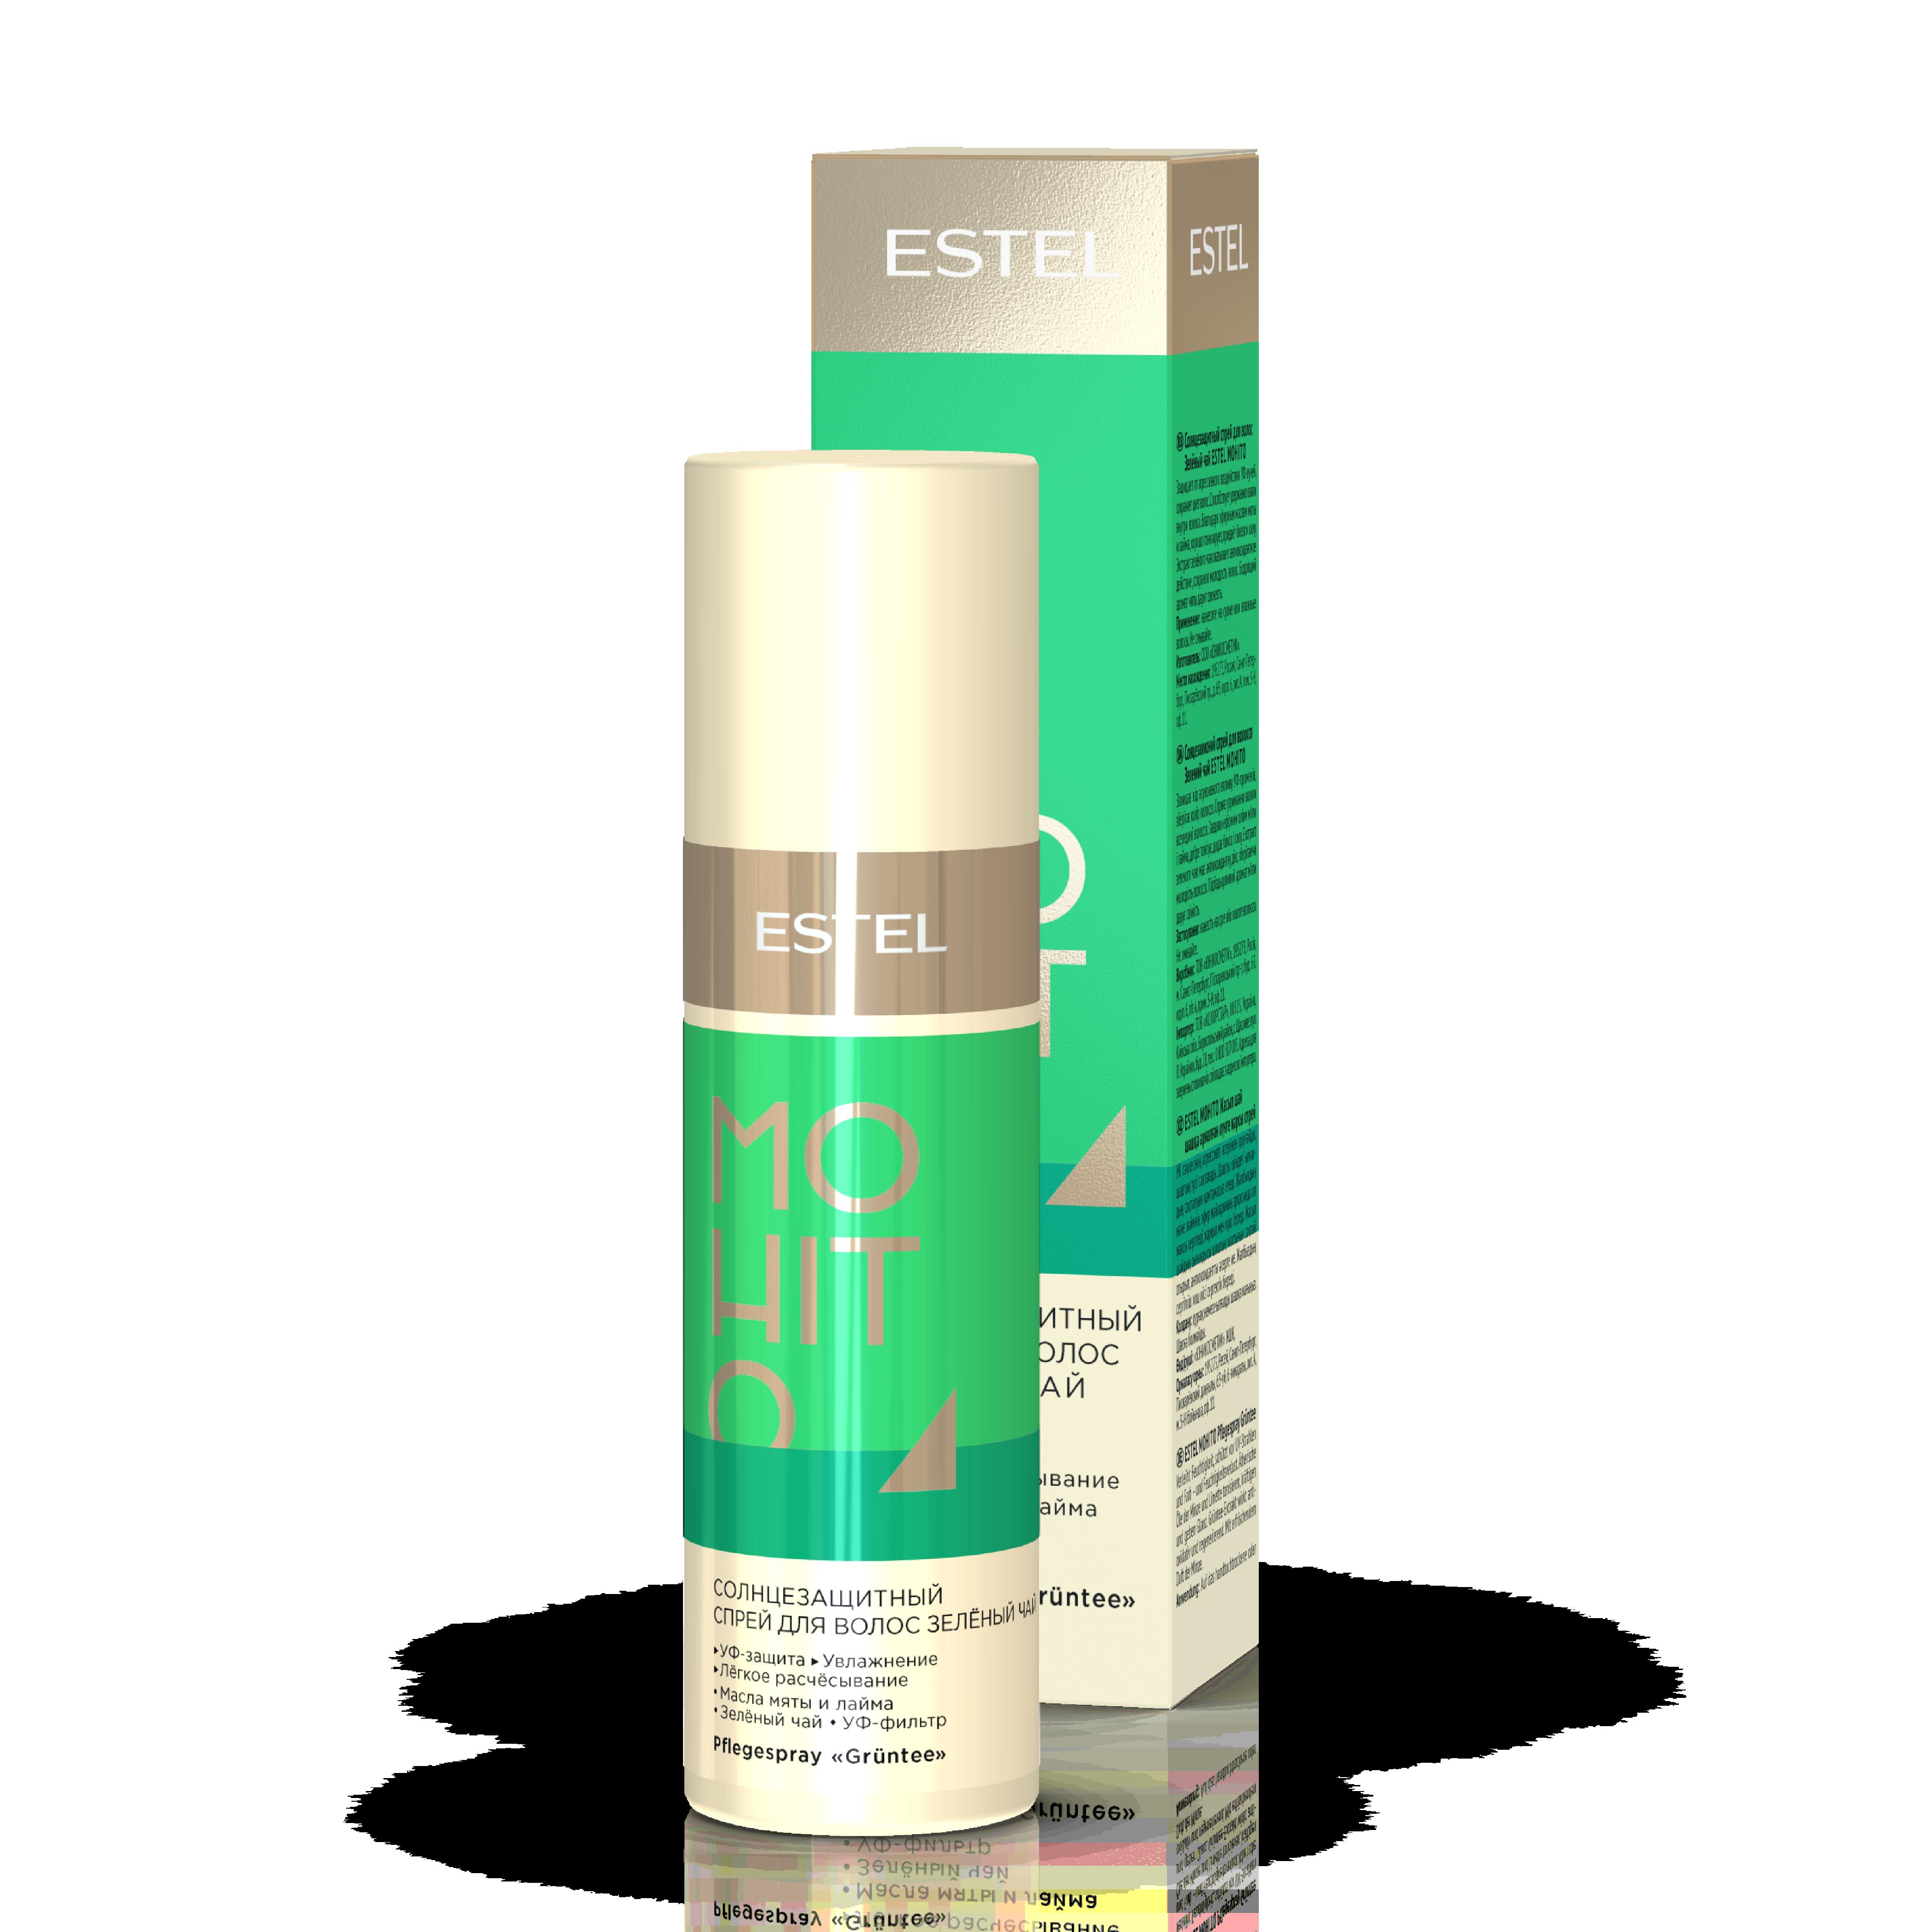 M/SP100 Spray protectie solara pentru par - ceai verde  ESTEL MOHITO (100 ml)